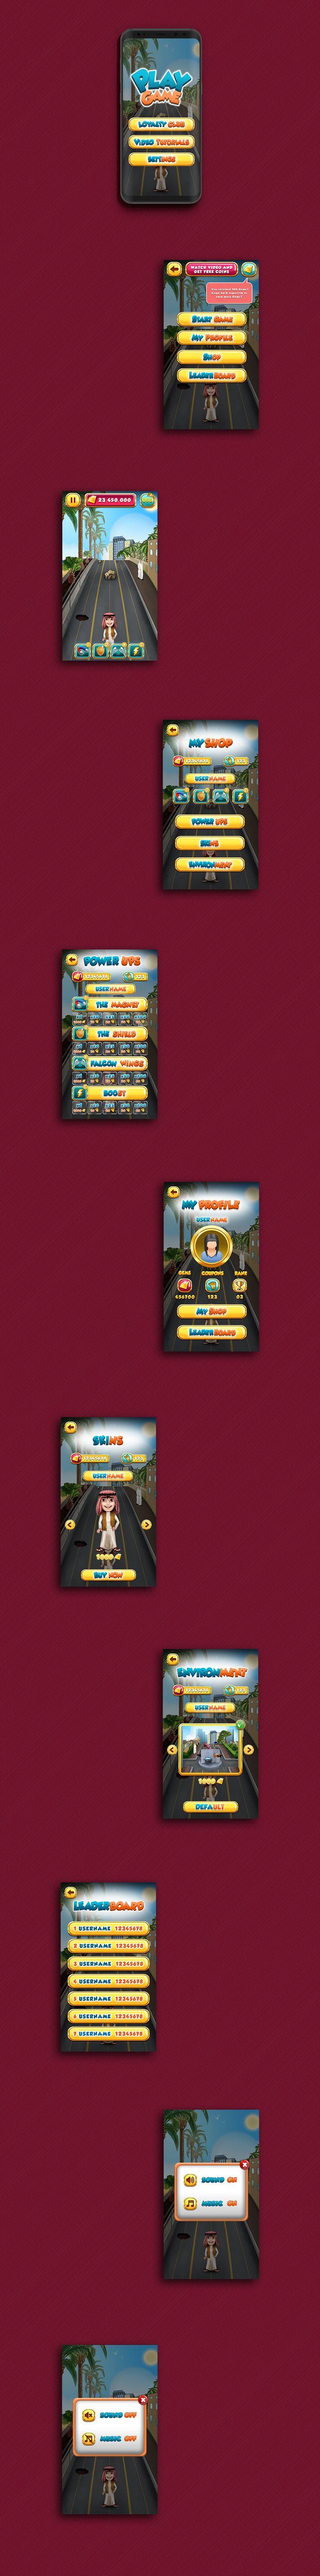 Best 25 runner games ideas on pinterest real world games maze runner game fandeluxe Gallery